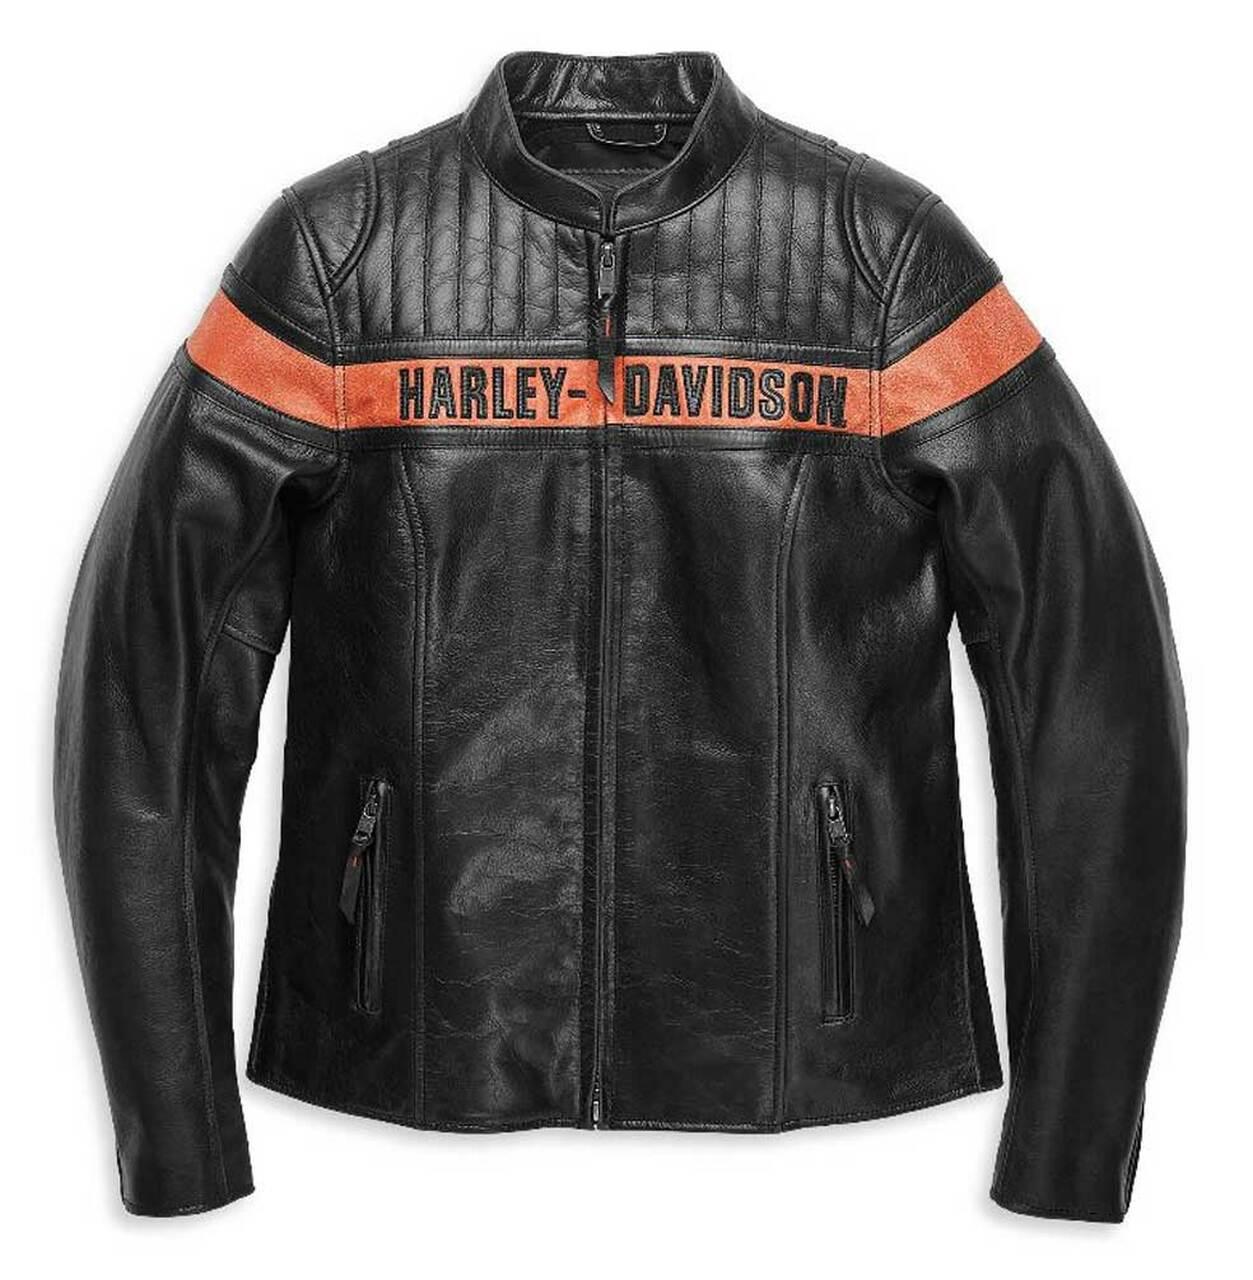 HARLEY DAVIDSON JACKET-VICTORY LAP,LEATHER,BLACK